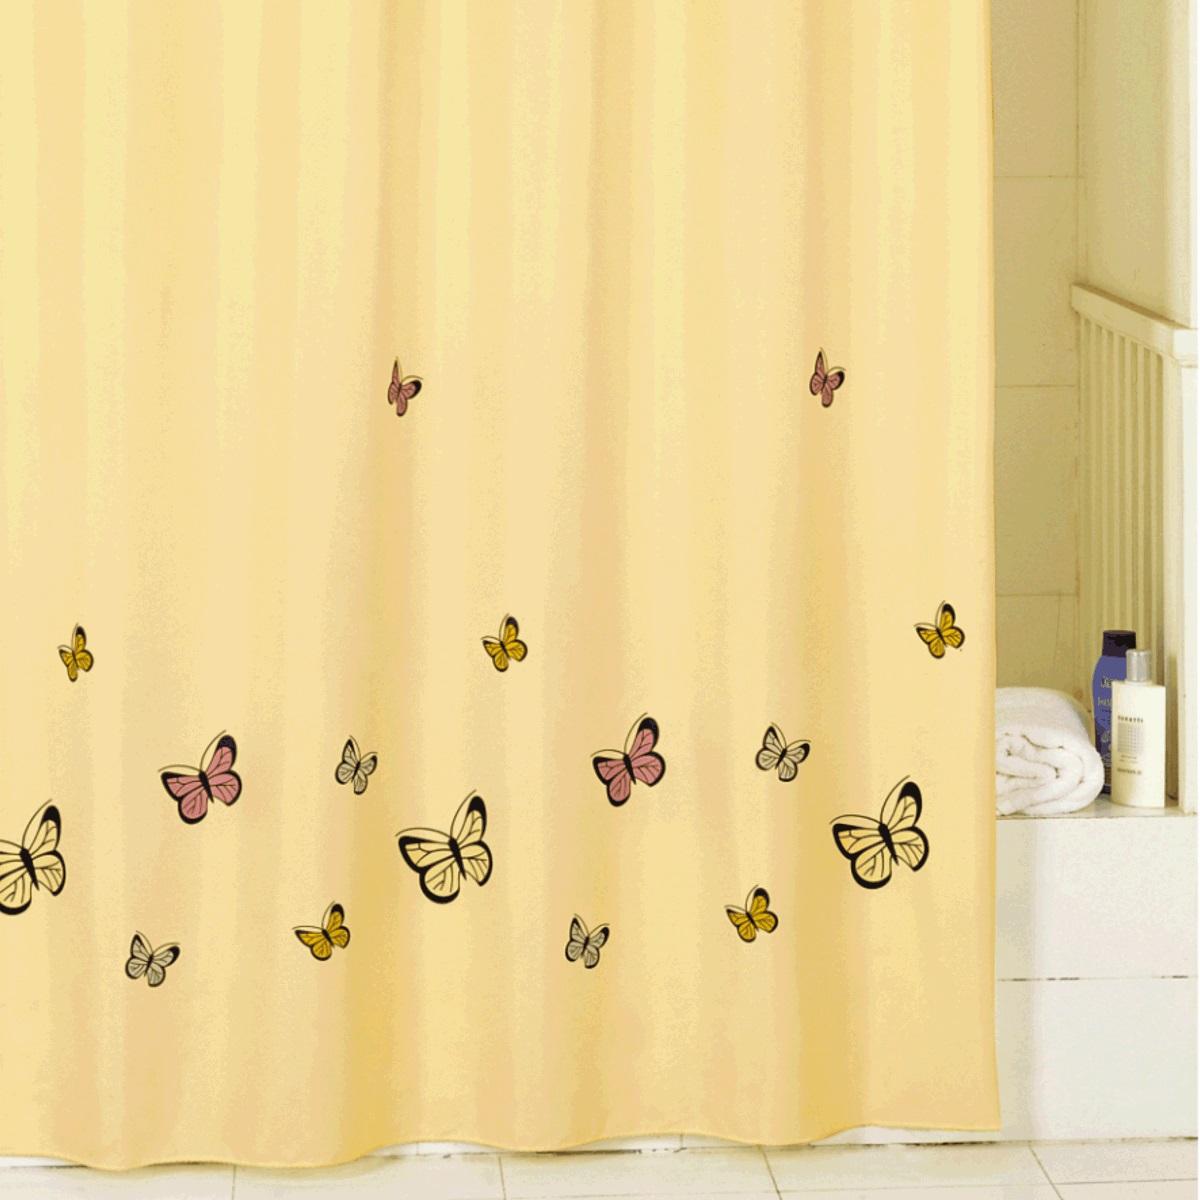 Штора для ванной Iddis Yellow Butterfly, цвет: желтый, 200 x 200 см штора для ванной iddis blue butterfly цвет голубой 200 x 200 см